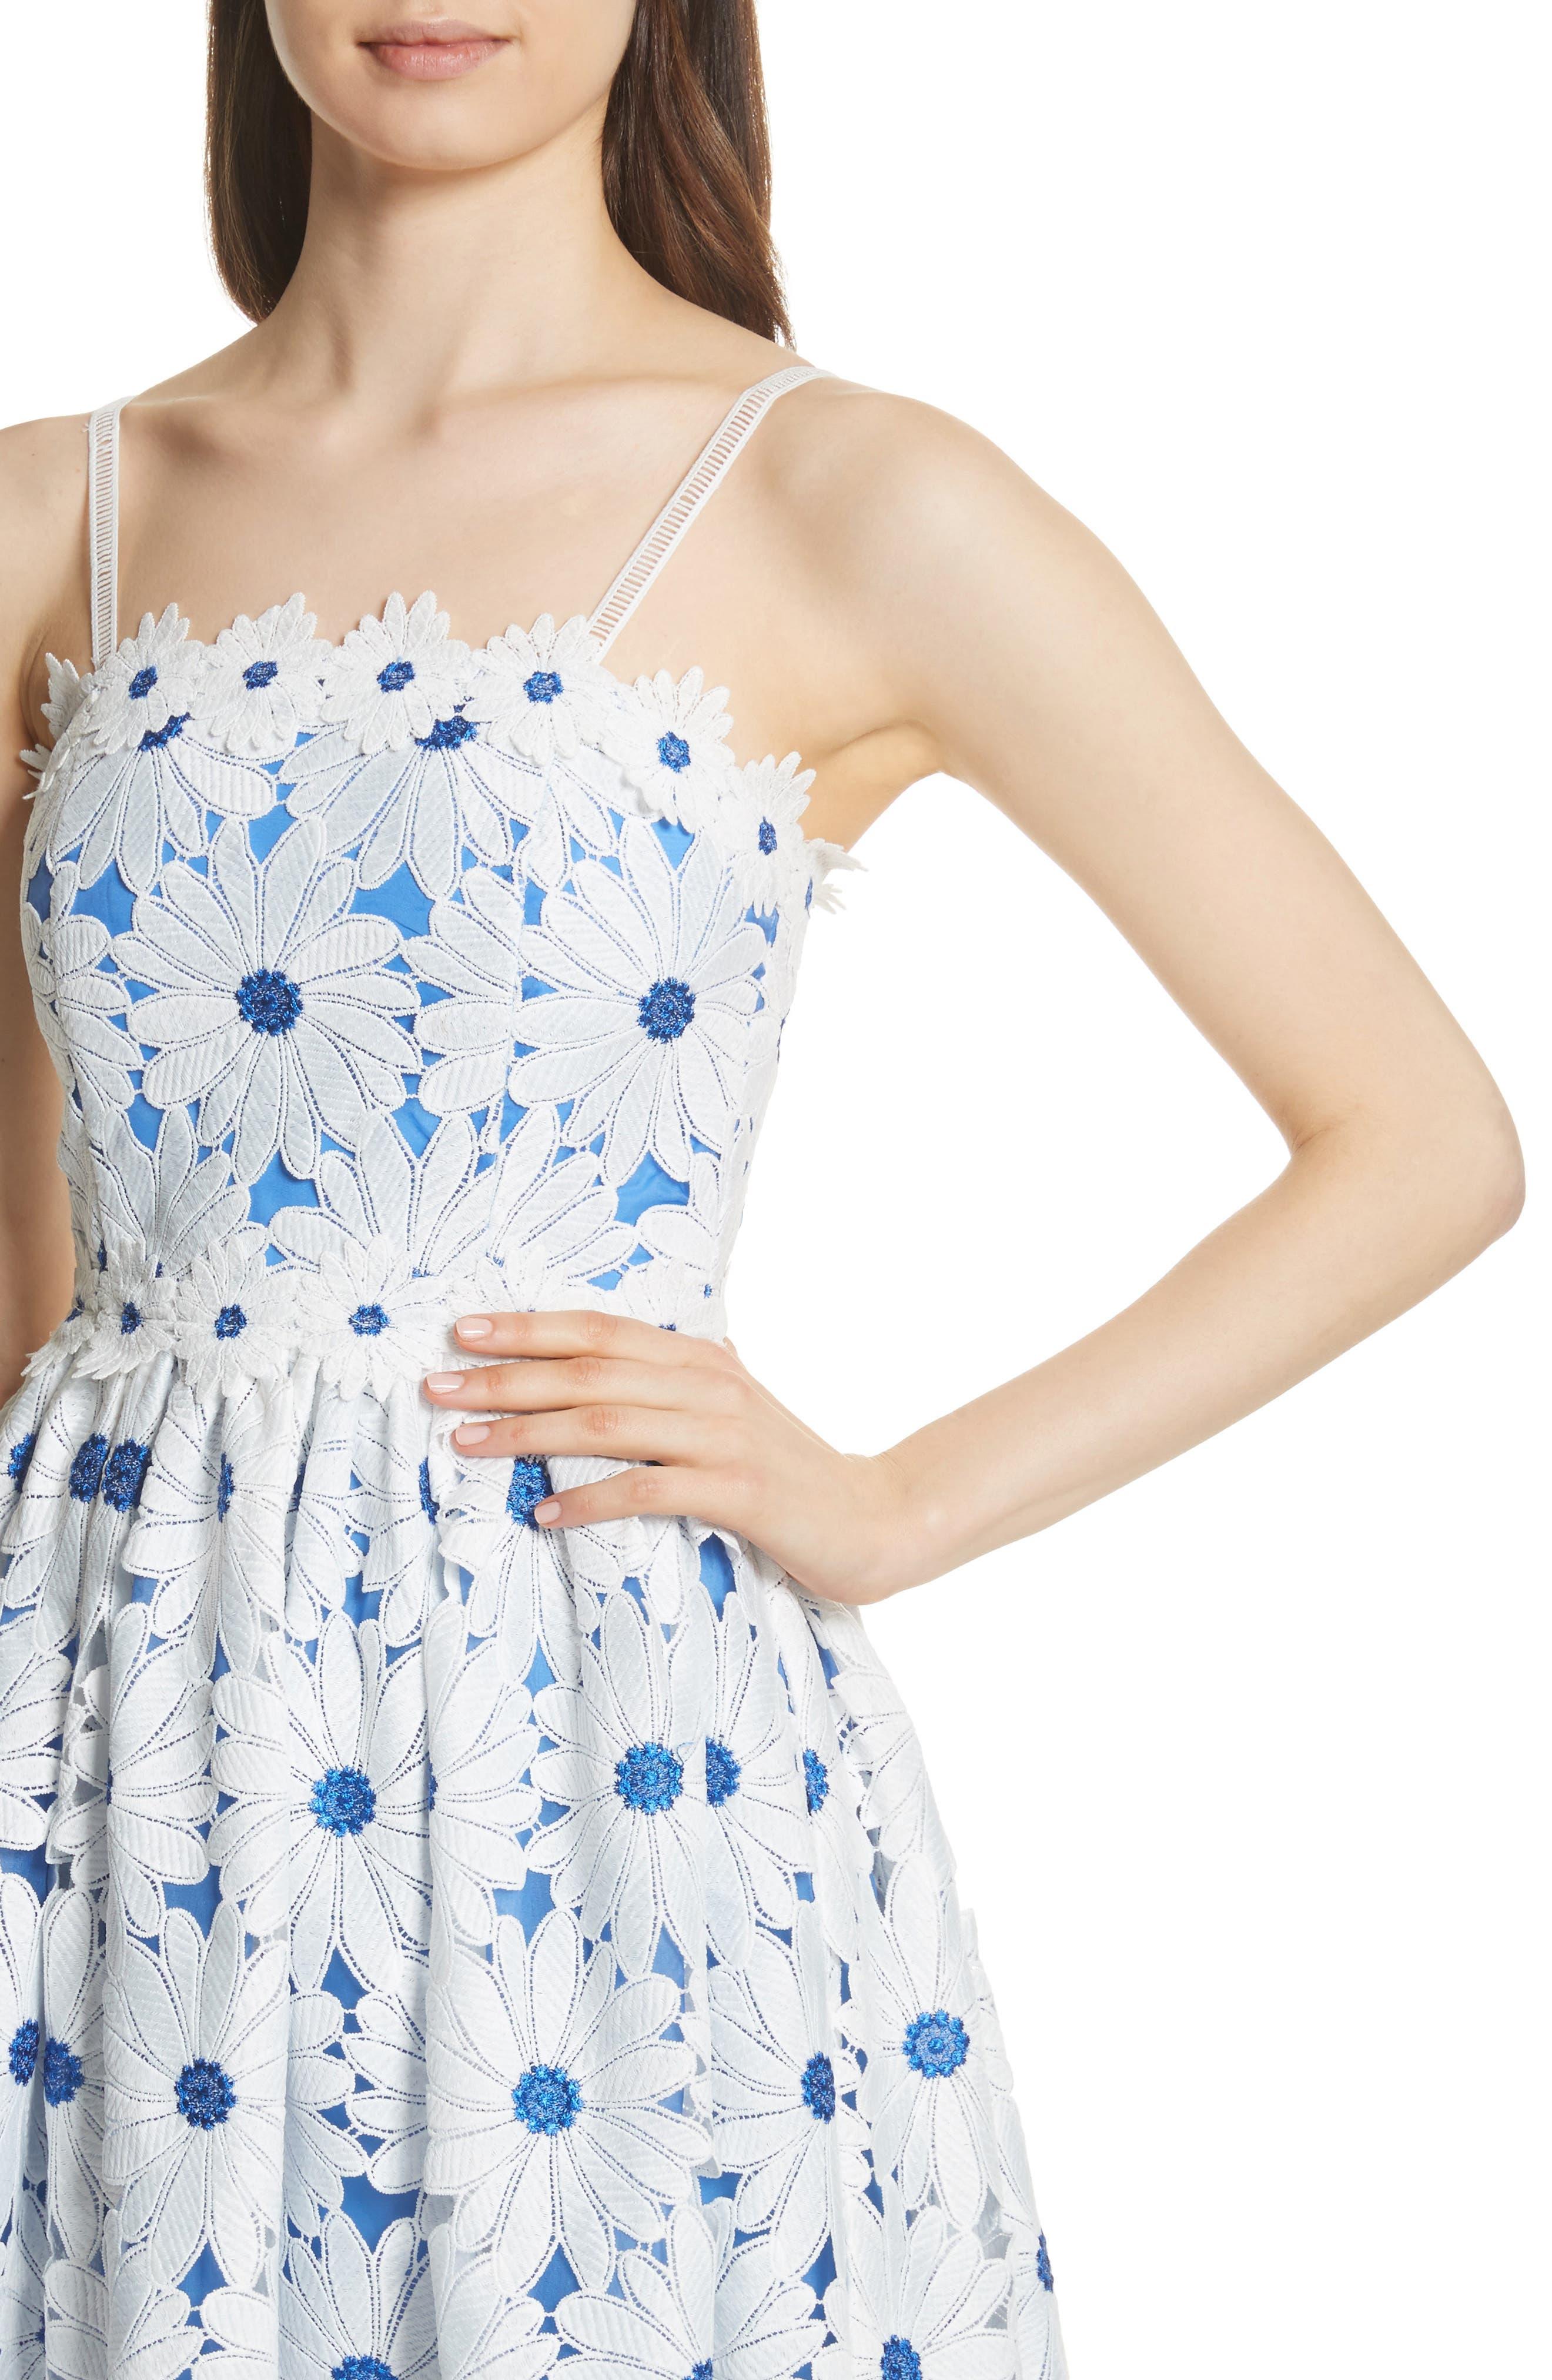 Vandy Lace Minidress,                             Alternate thumbnail 4, color,                             White/ Blue